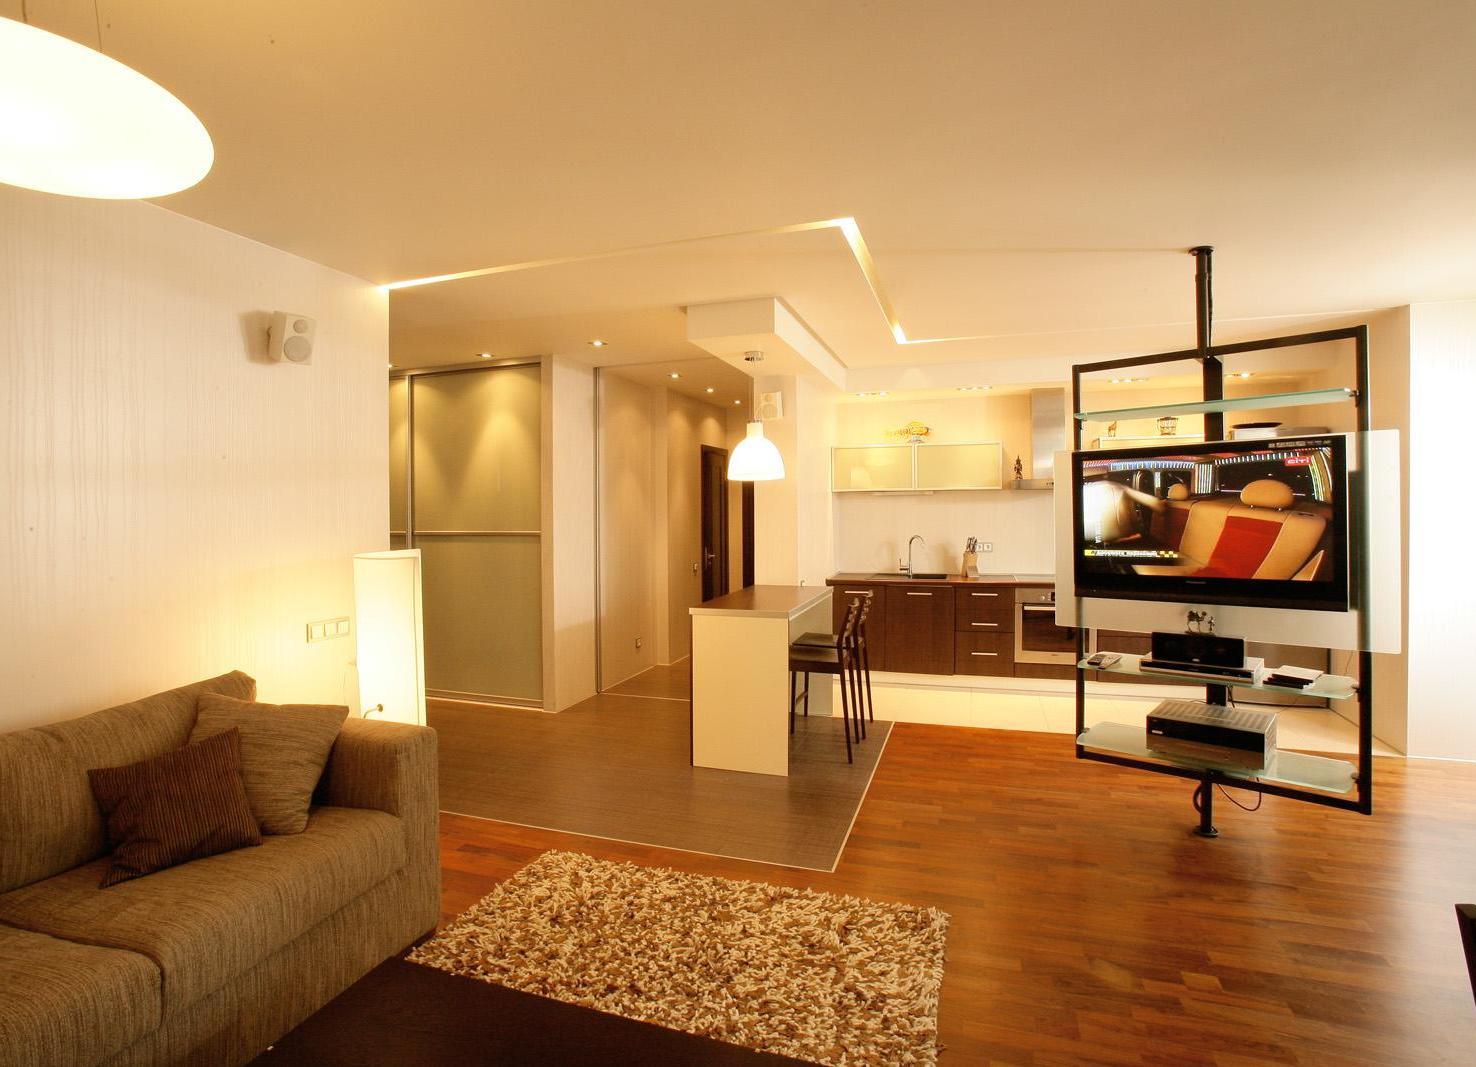 Недорогой интерьер для однокомнатной квартиры фото